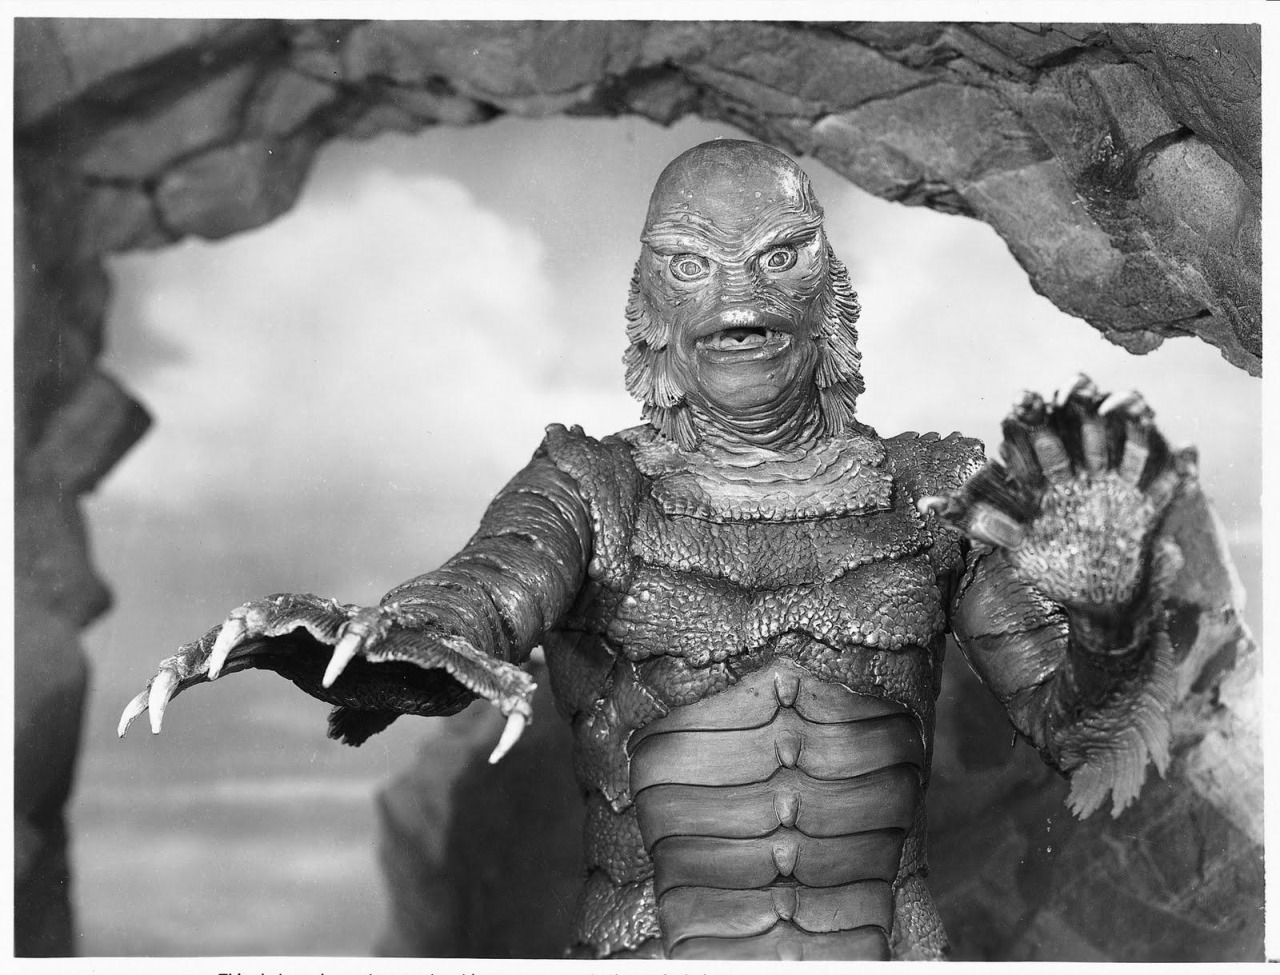 Ben Chapman in Creature from the Black Lagoon (1954)